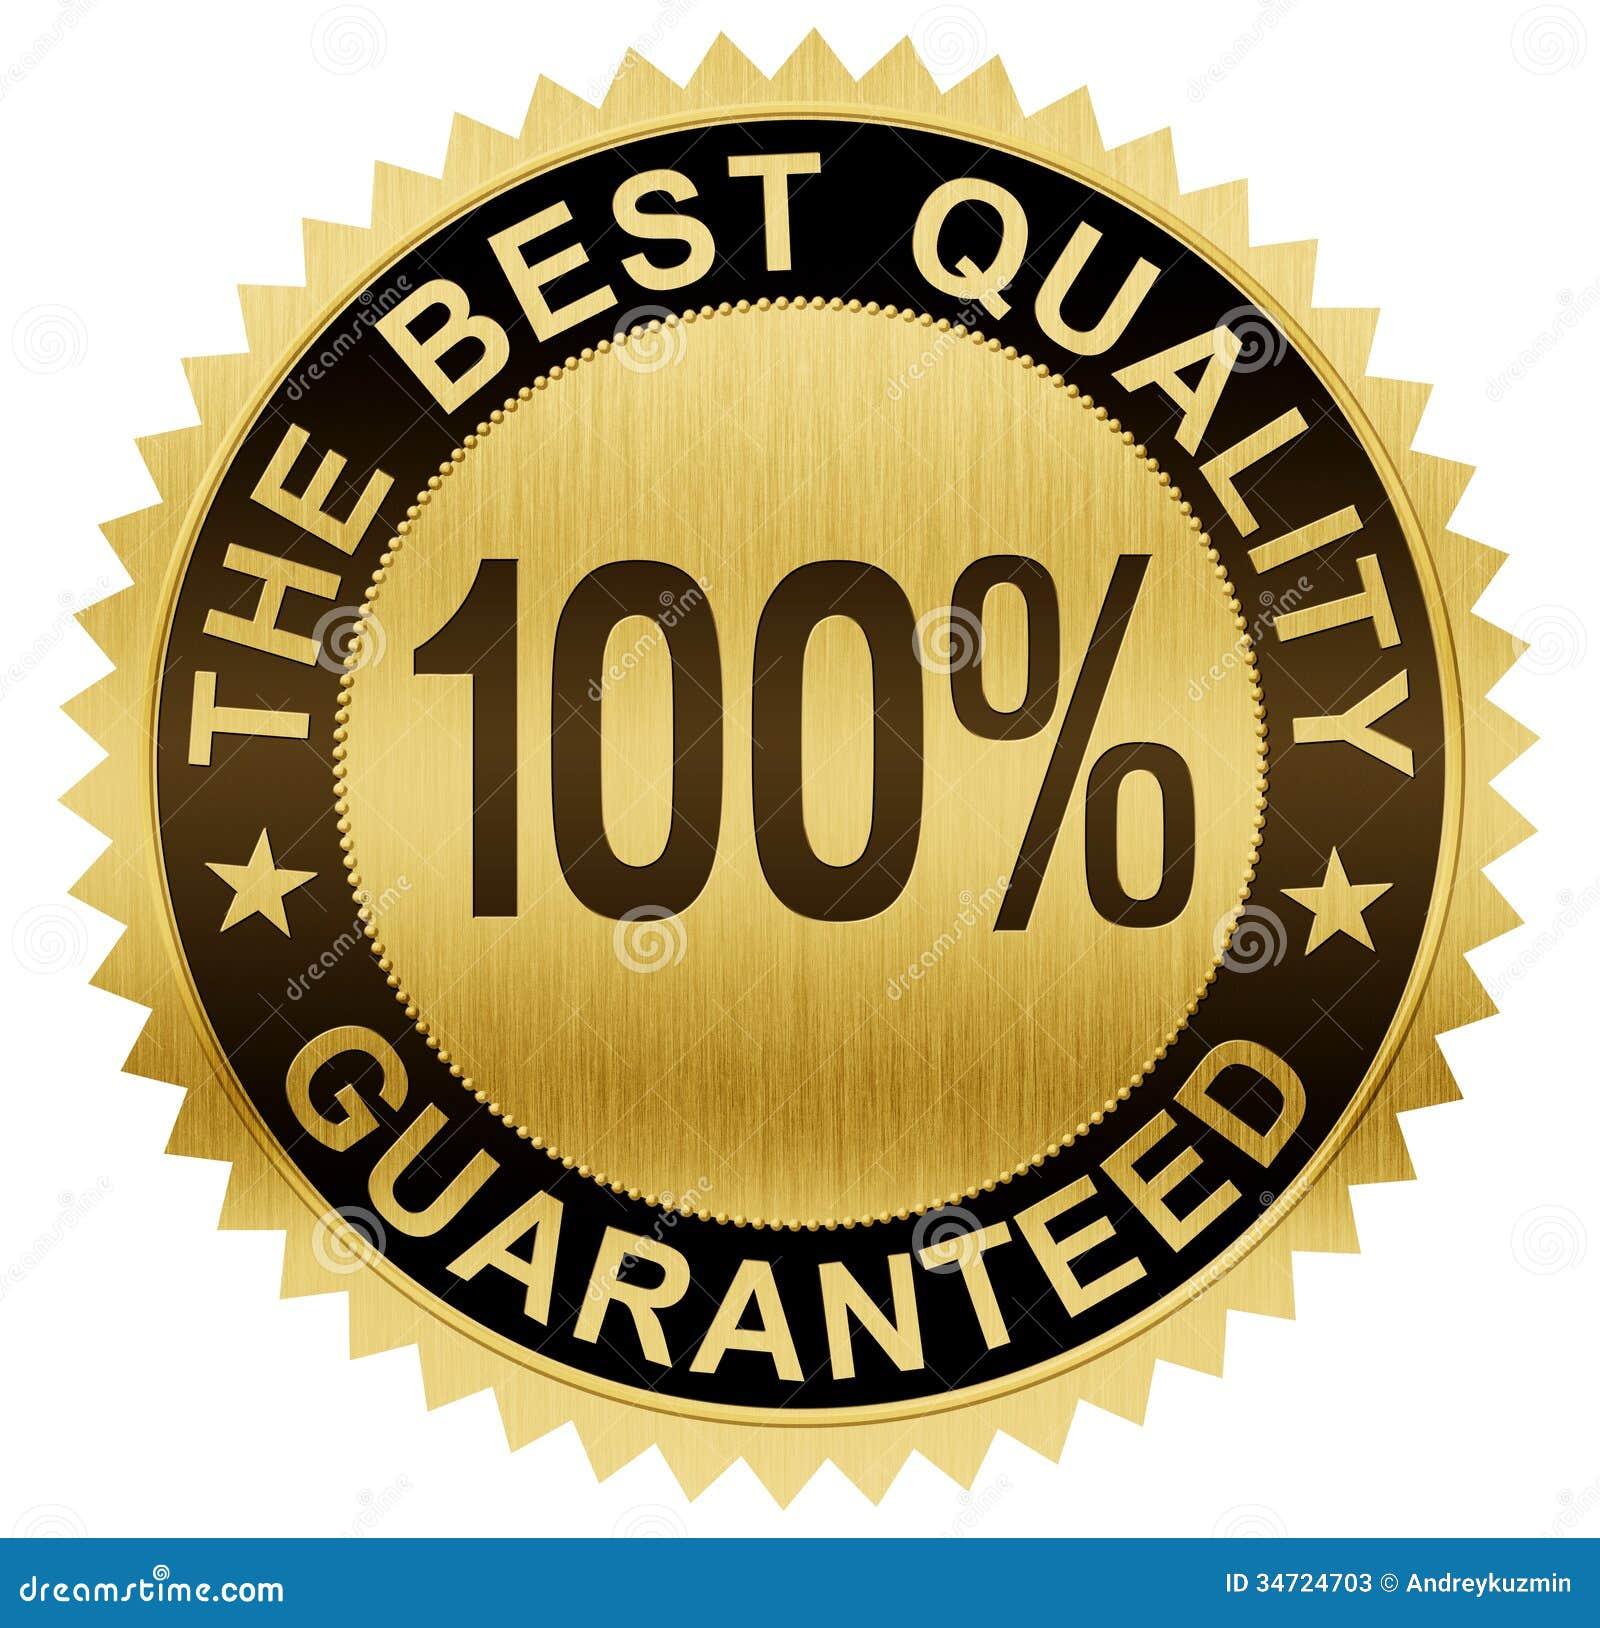 beste qualit t garantierte golddichtungsmedaille mit beschneidungspfad stock abbildung bild. Black Bedroom Furniture Sets. Home Design Ideas